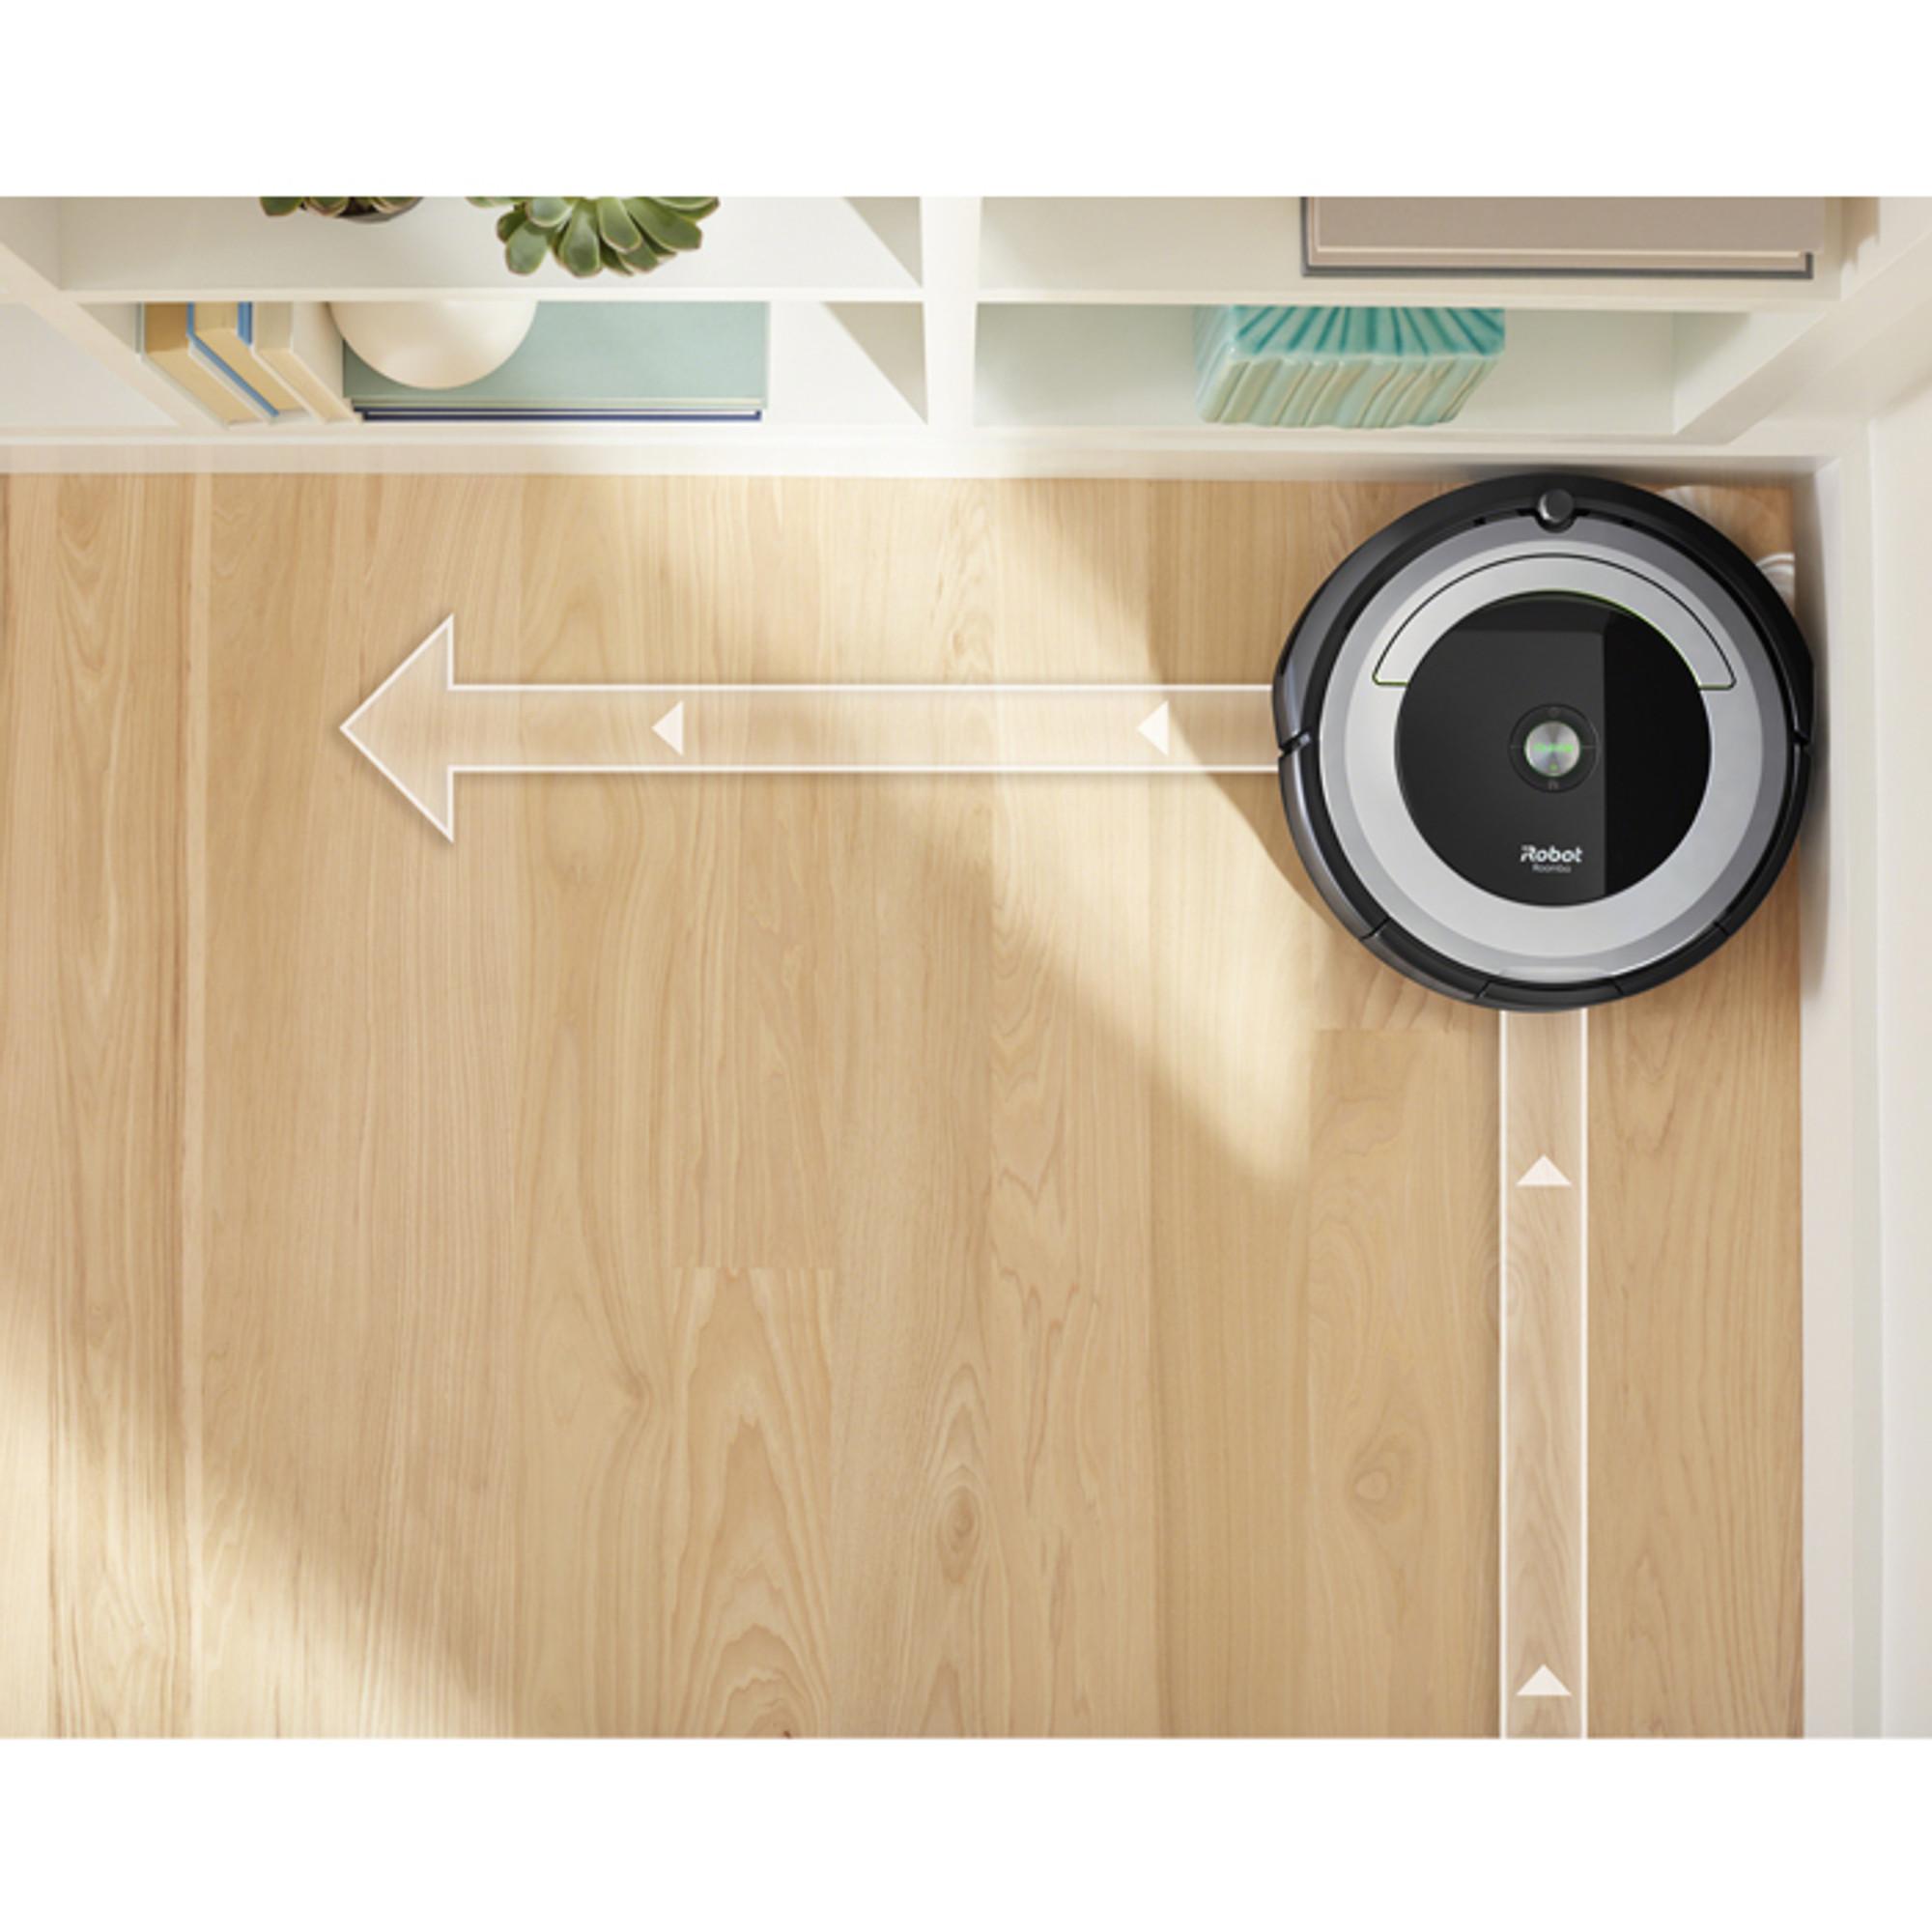 Roomba 690 Robot Vacuum Cleaner